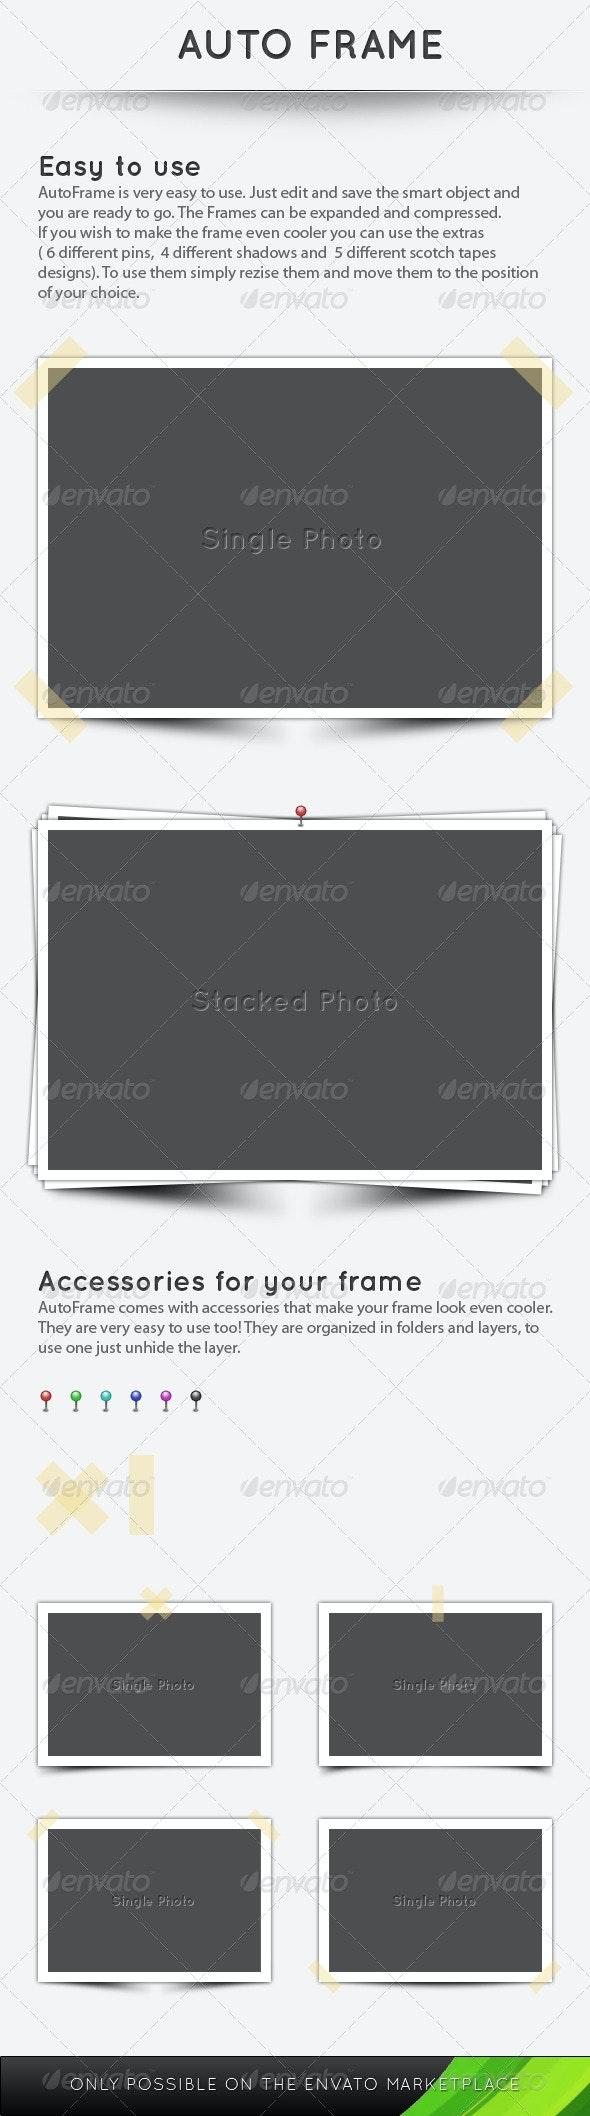 AutoFrame - Miscellaneous Web Elements